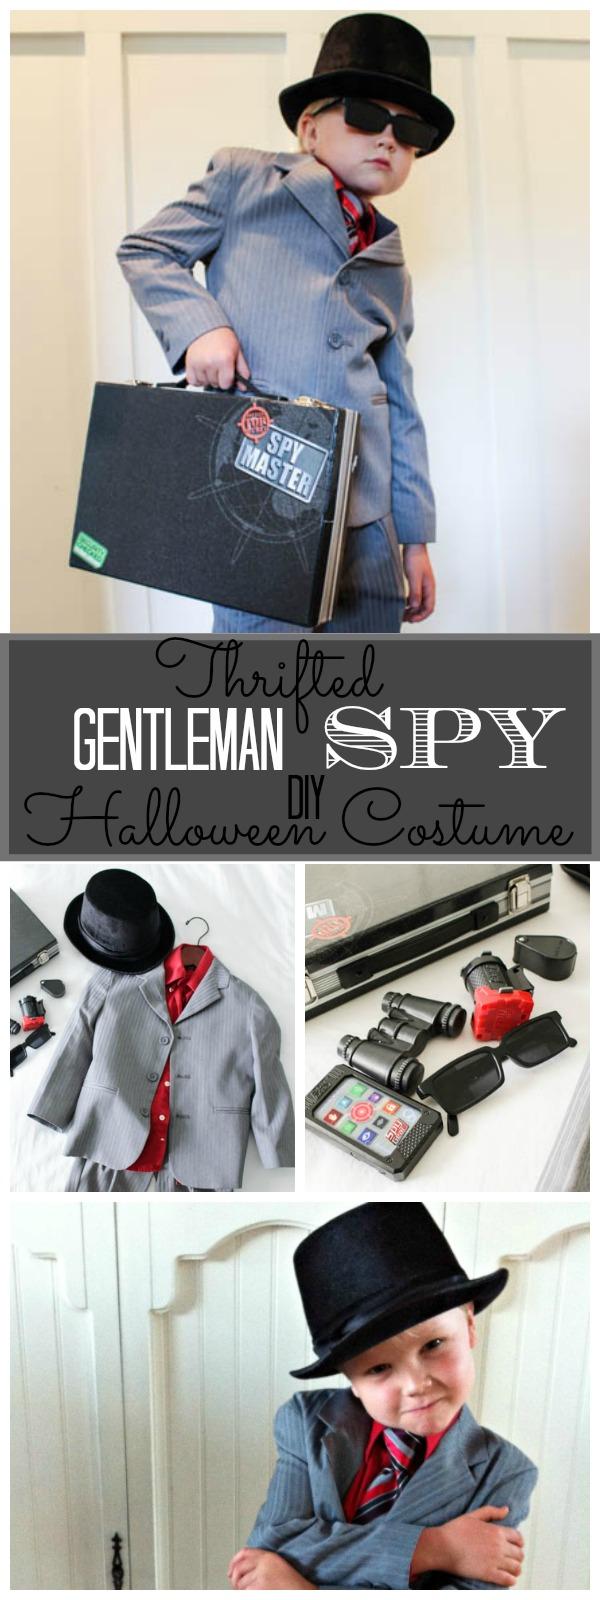 Thrifted Gentleman Spy DIY Halloween Costume at The Happy Housie